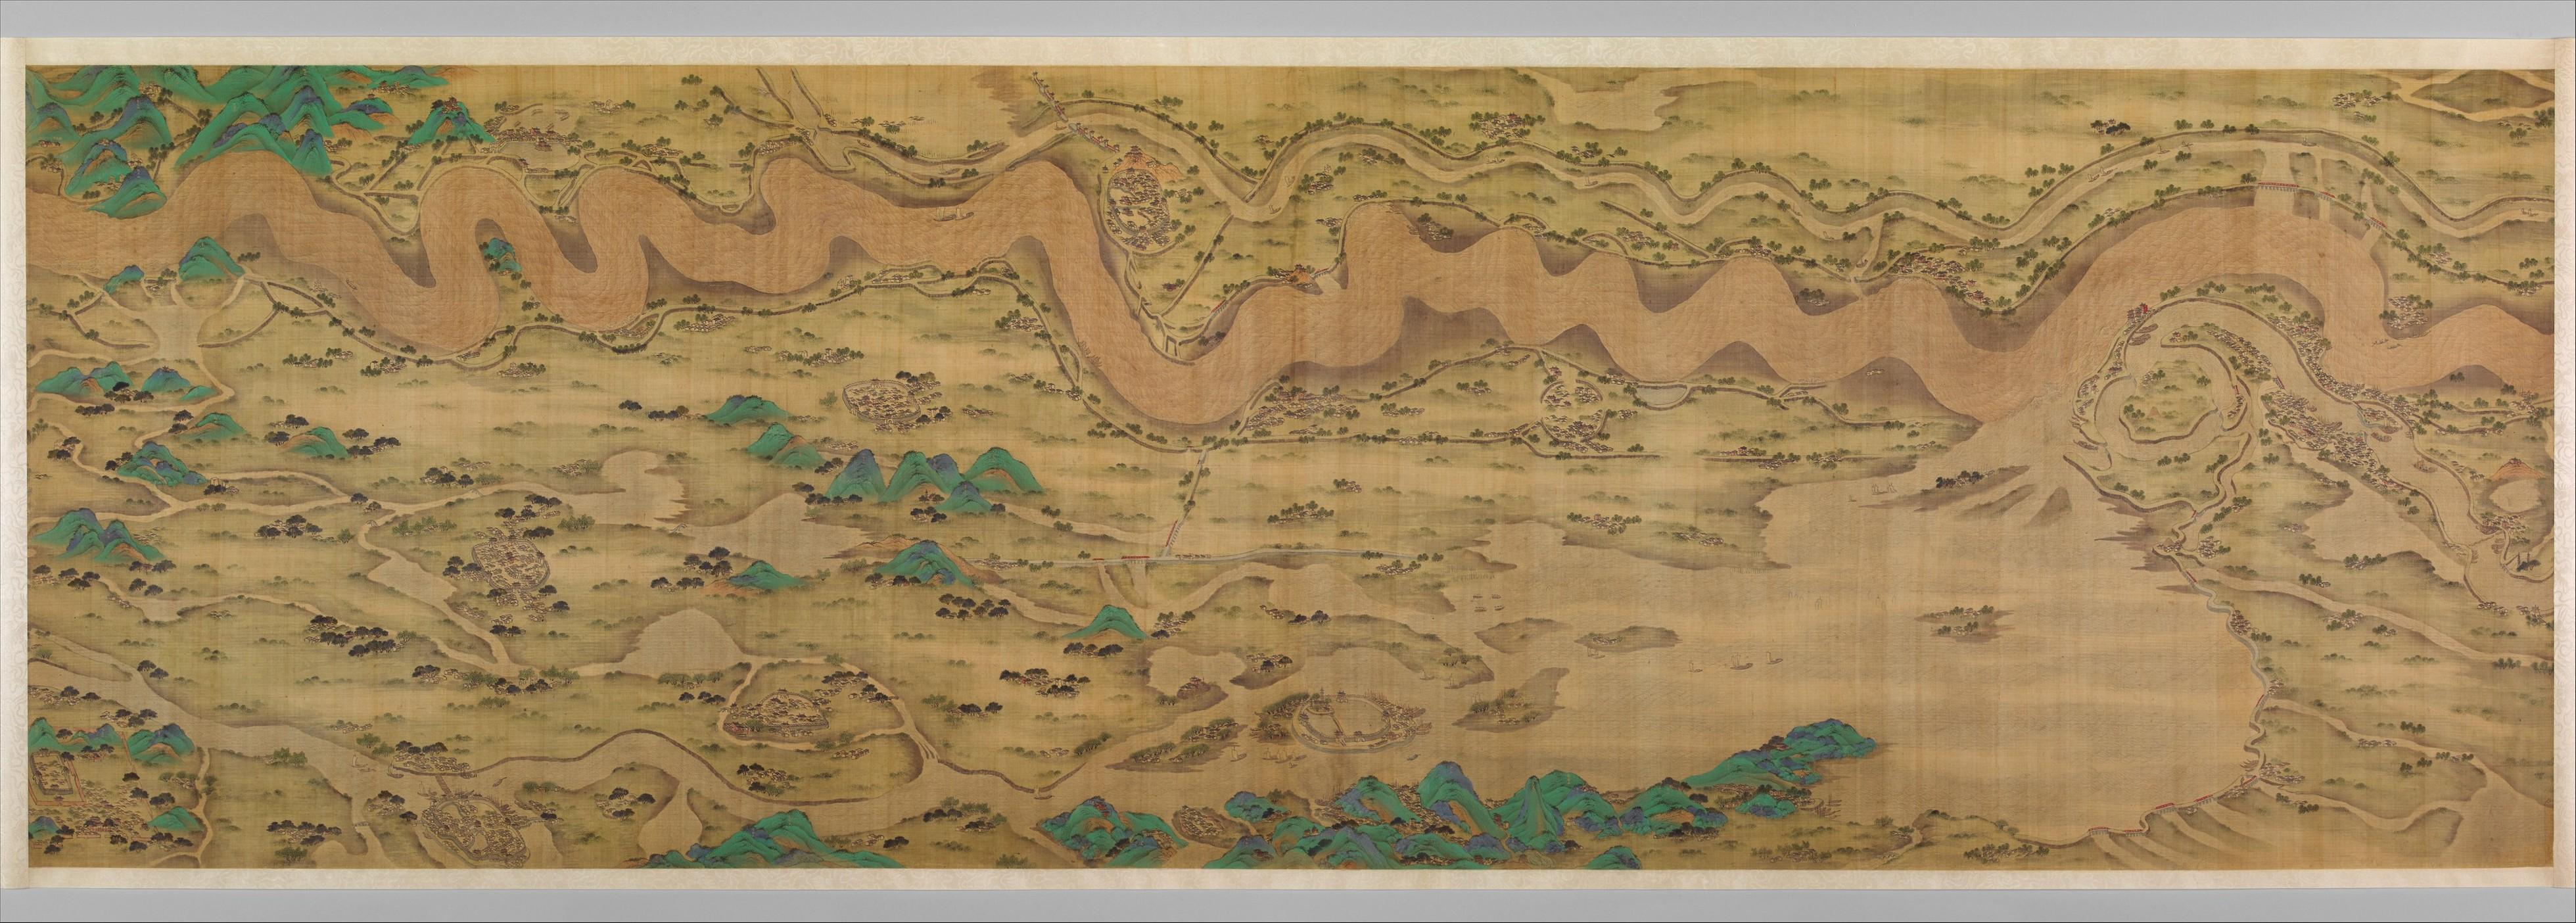 Yellow River On Map on caspian sea on map, mediterranean sea on map, euphrates river on map, manchuria on map, hindu kush on map, gobi desert on map, chang river on map, jordan river on map, yellow river china map, north china plain map, philippines on map, amazon river on map, yangtze on map, yalu river on map, tigris river on map, colorado river on map, himalayas on map, china on map, ganges river on map, taklamakan desert on map,